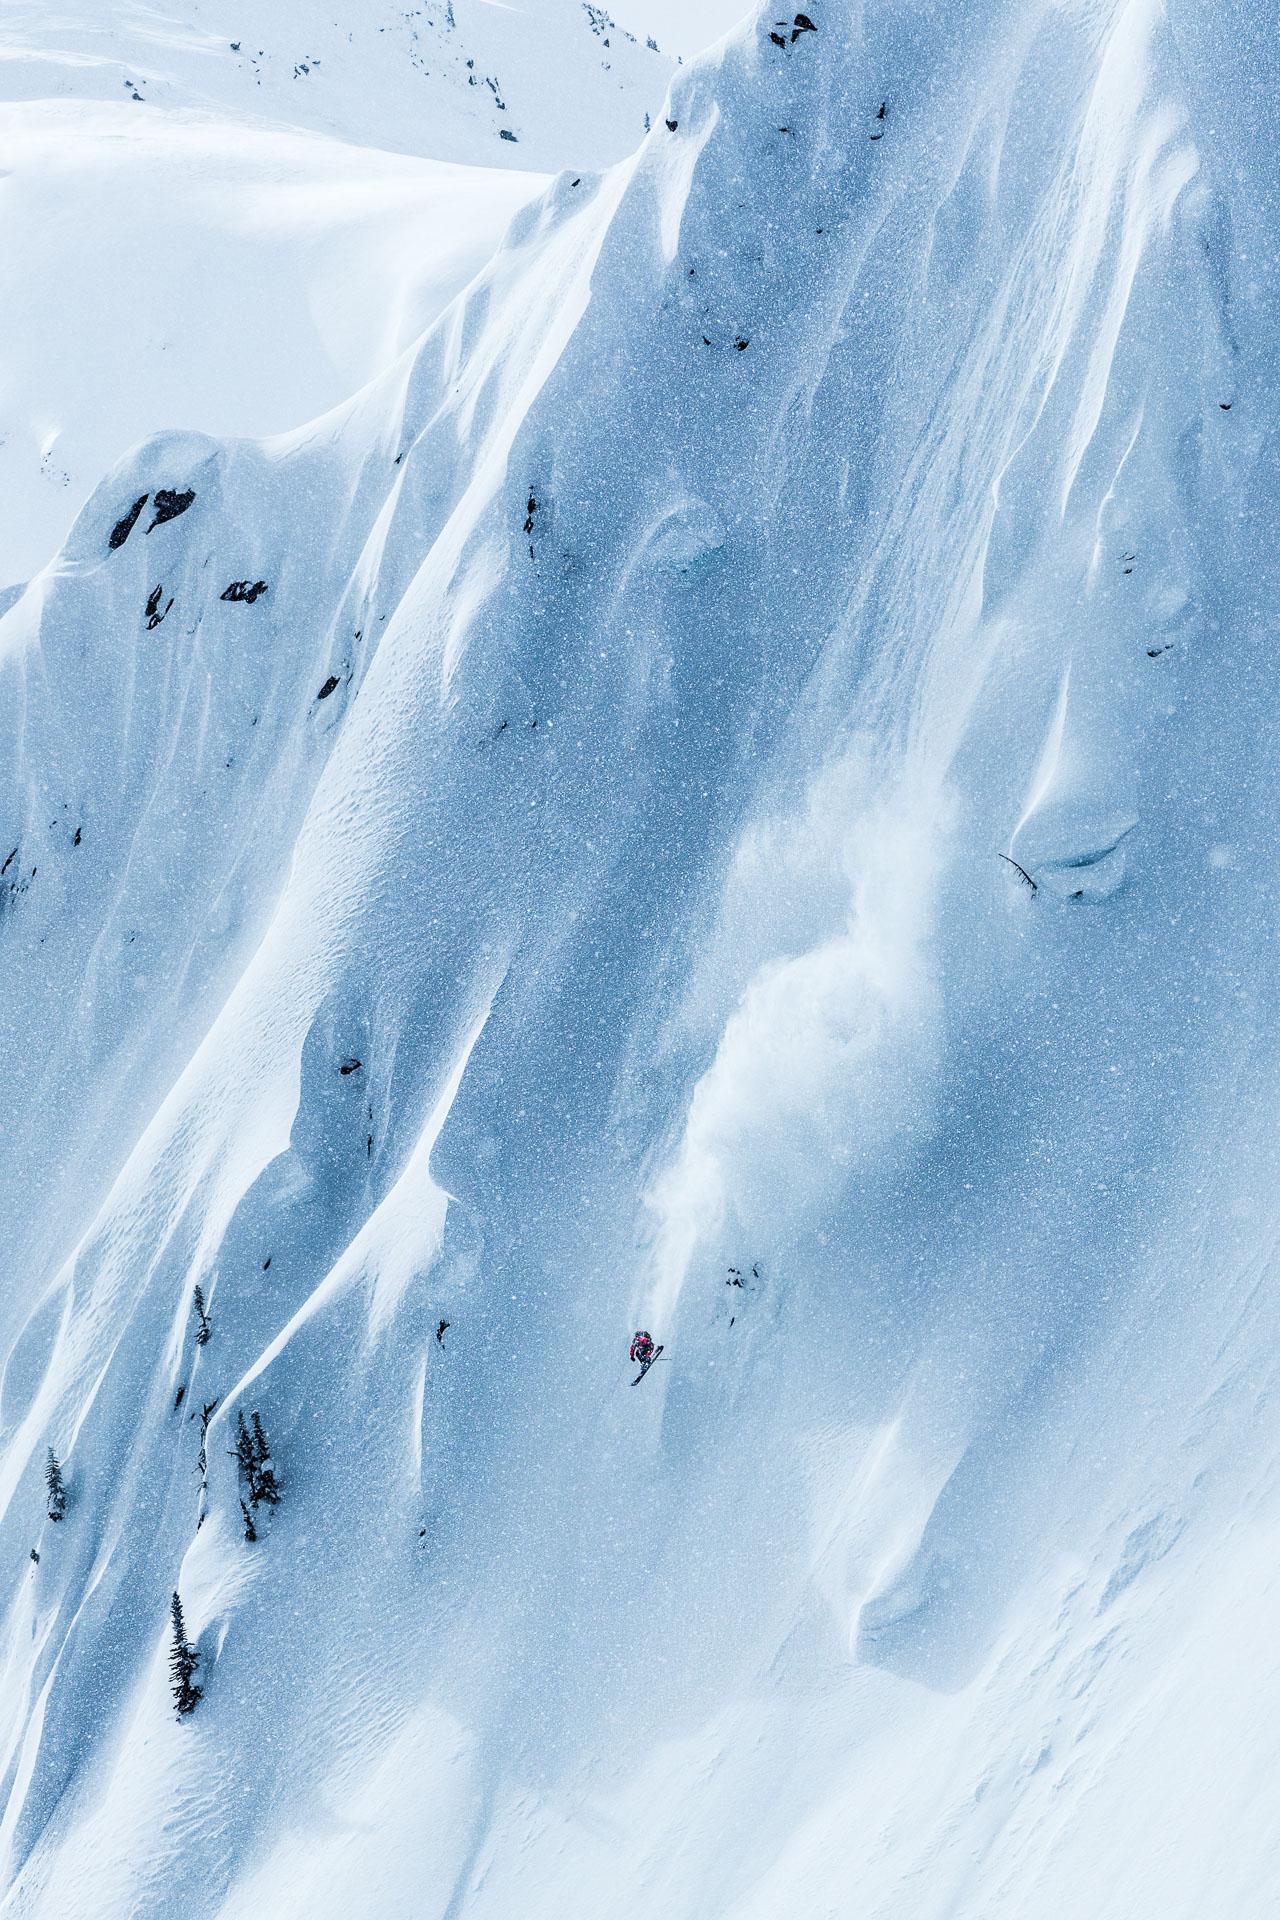 Parker White, Canada